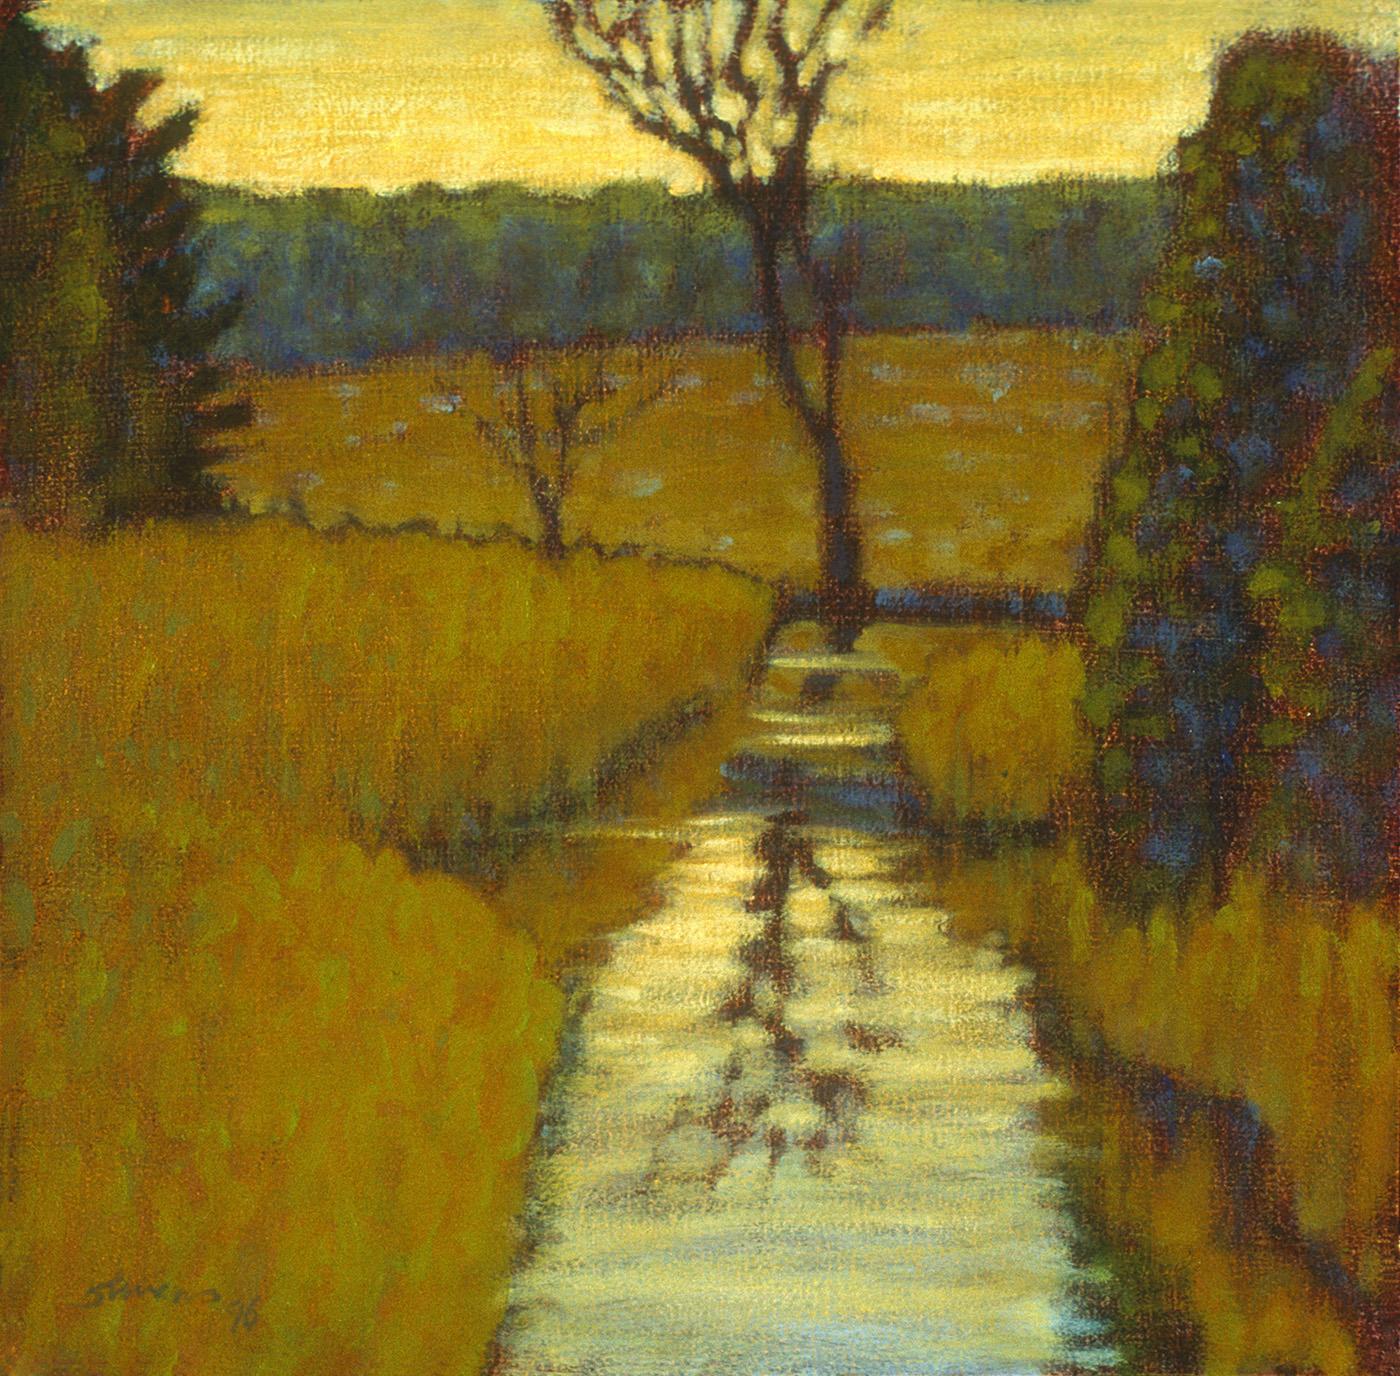 "Cedar Creek in Spring   | oil on canvas | 12 x 12"" | 1996"